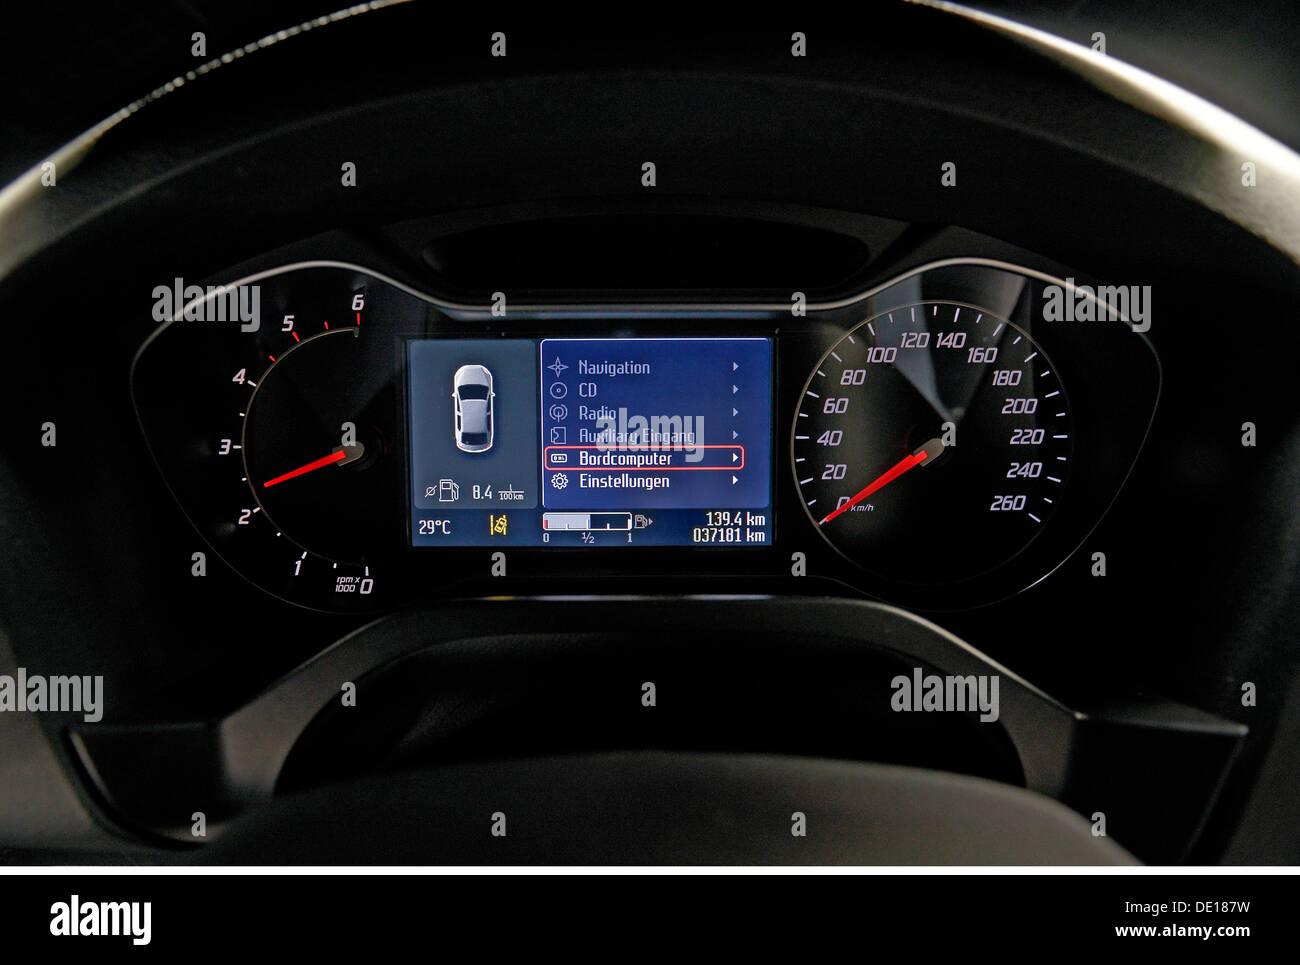 Armaturenbrett auto  Verkehr / Transport Auto Geschwindigkeit Auto Armaturenbrett Gerät ...